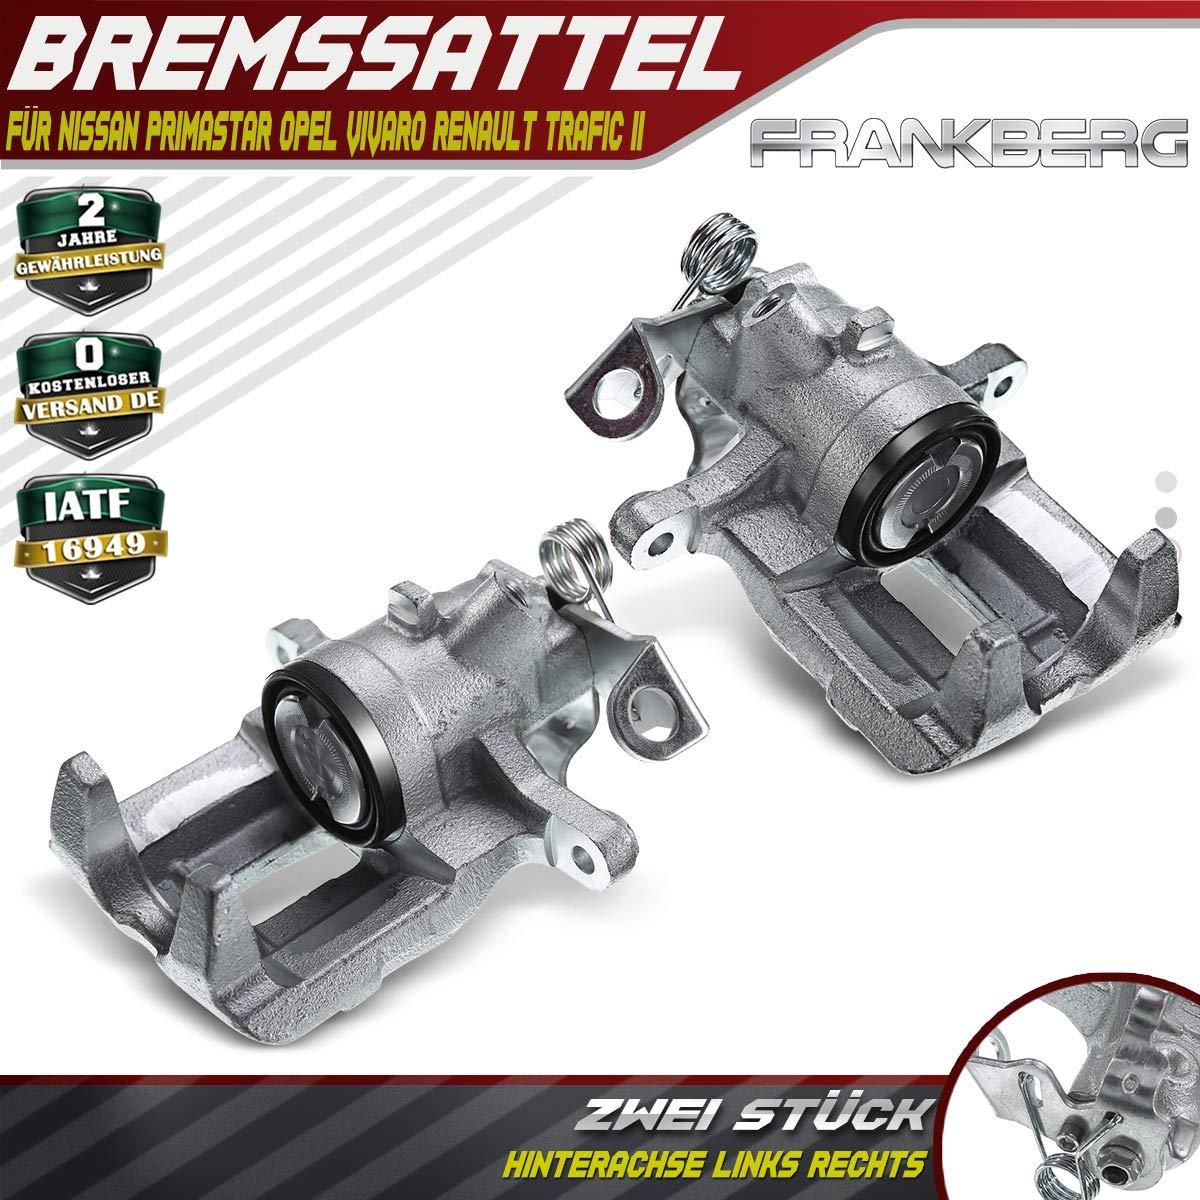 2x Bremssattel Bremszange Hinterachse Links Rechts f/ür Primaster X83 Vivaro J7 F7 E7 Trafic II JL FL EL Trafic III JG/_ FG/_ EG/_ 2001-2019